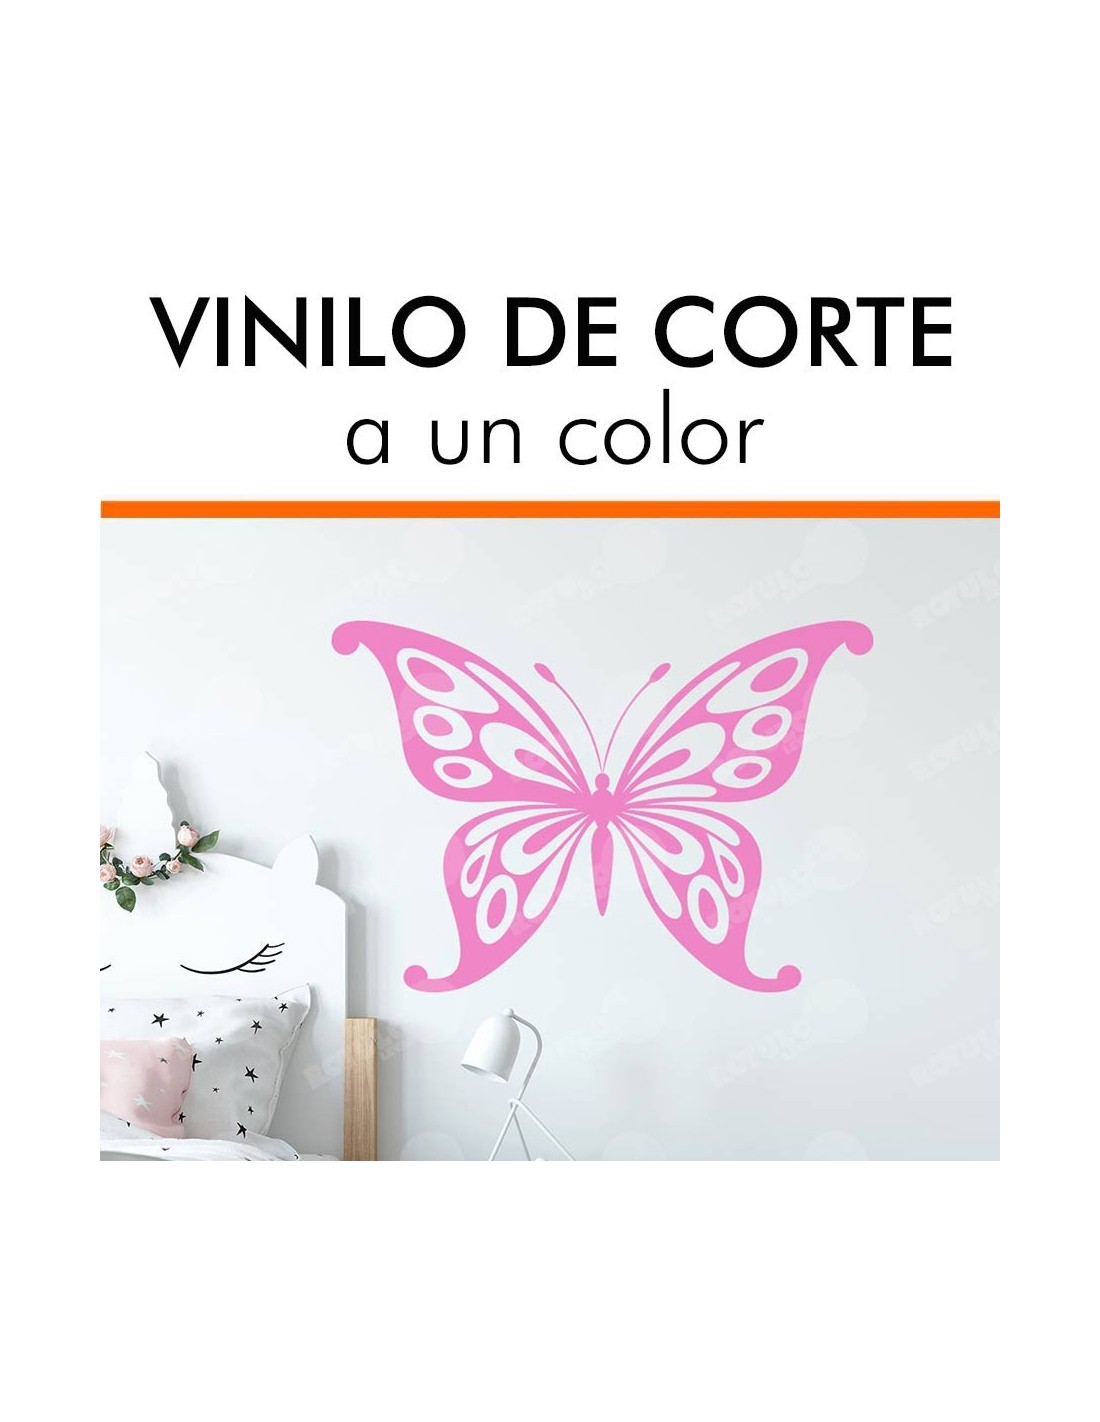 Vinilo de corte a color